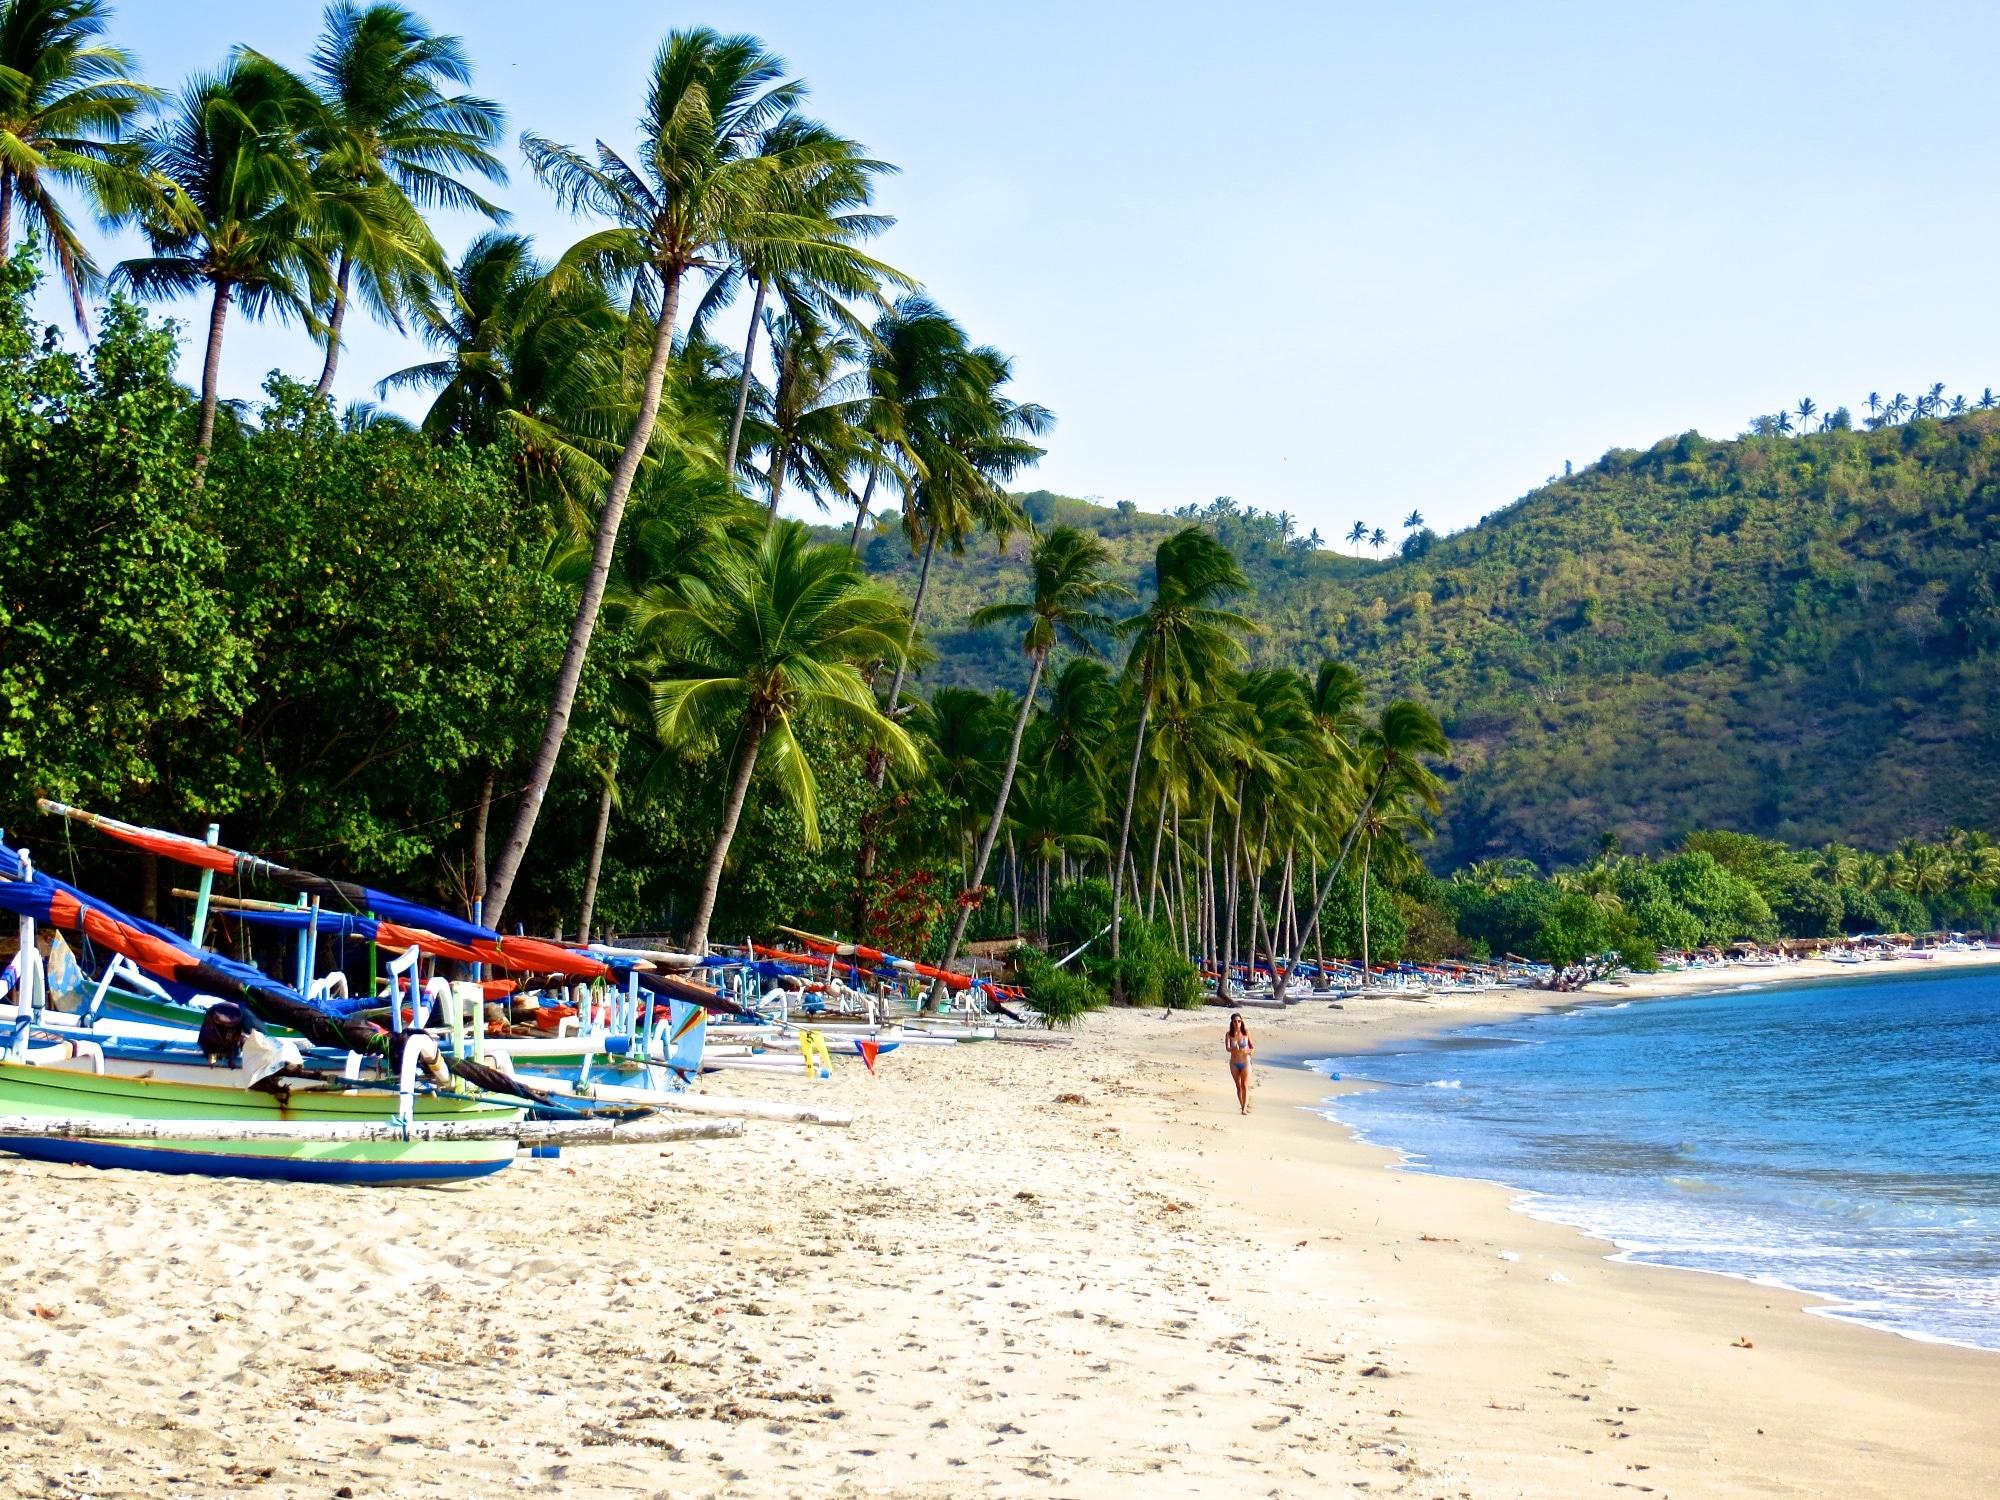 Hasil gambar untuk gambar pantai lombok